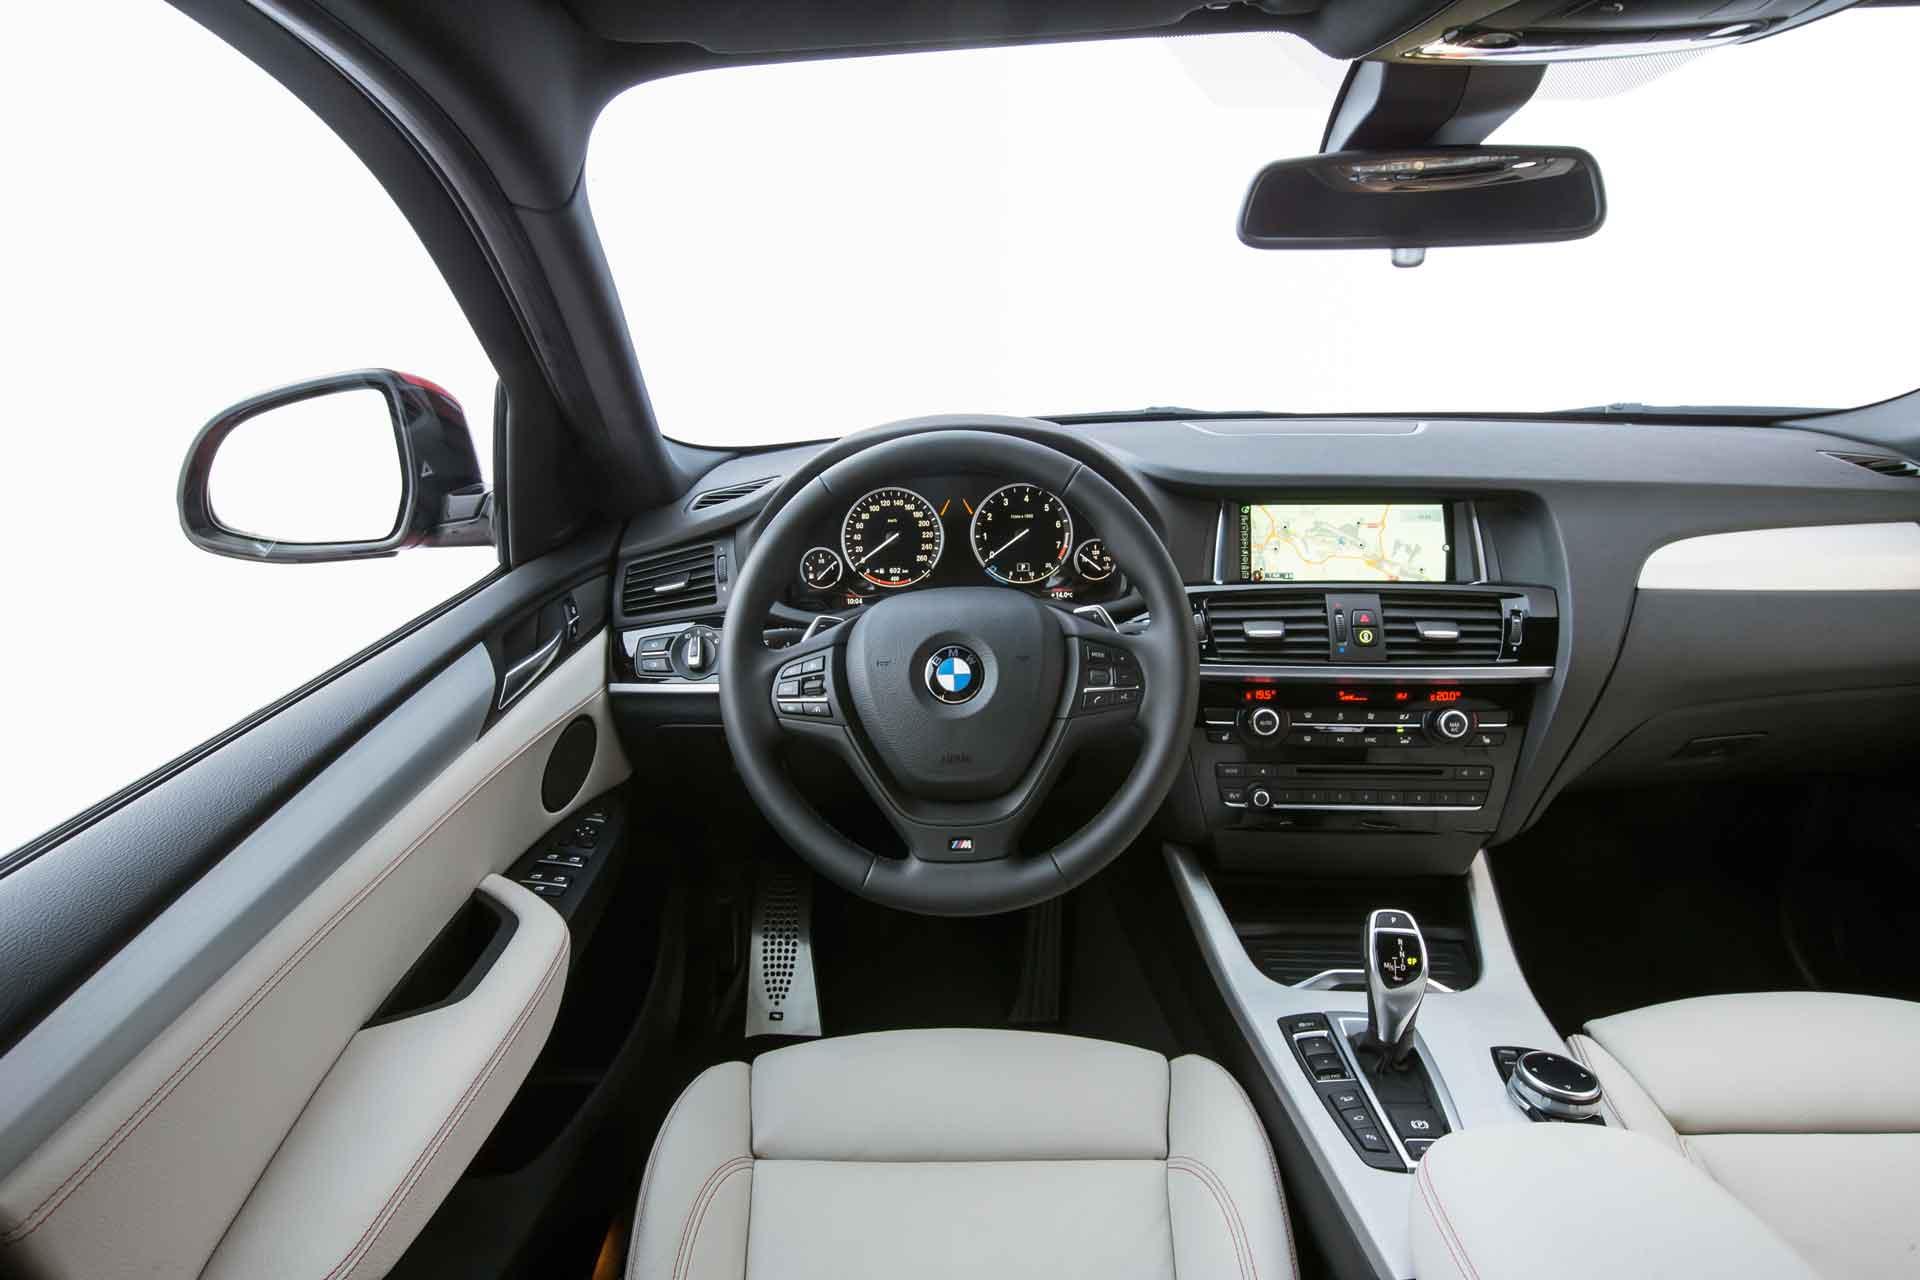 2015 Bmw X4 Xdrive35i Sports Activity Coupe Small Wonder